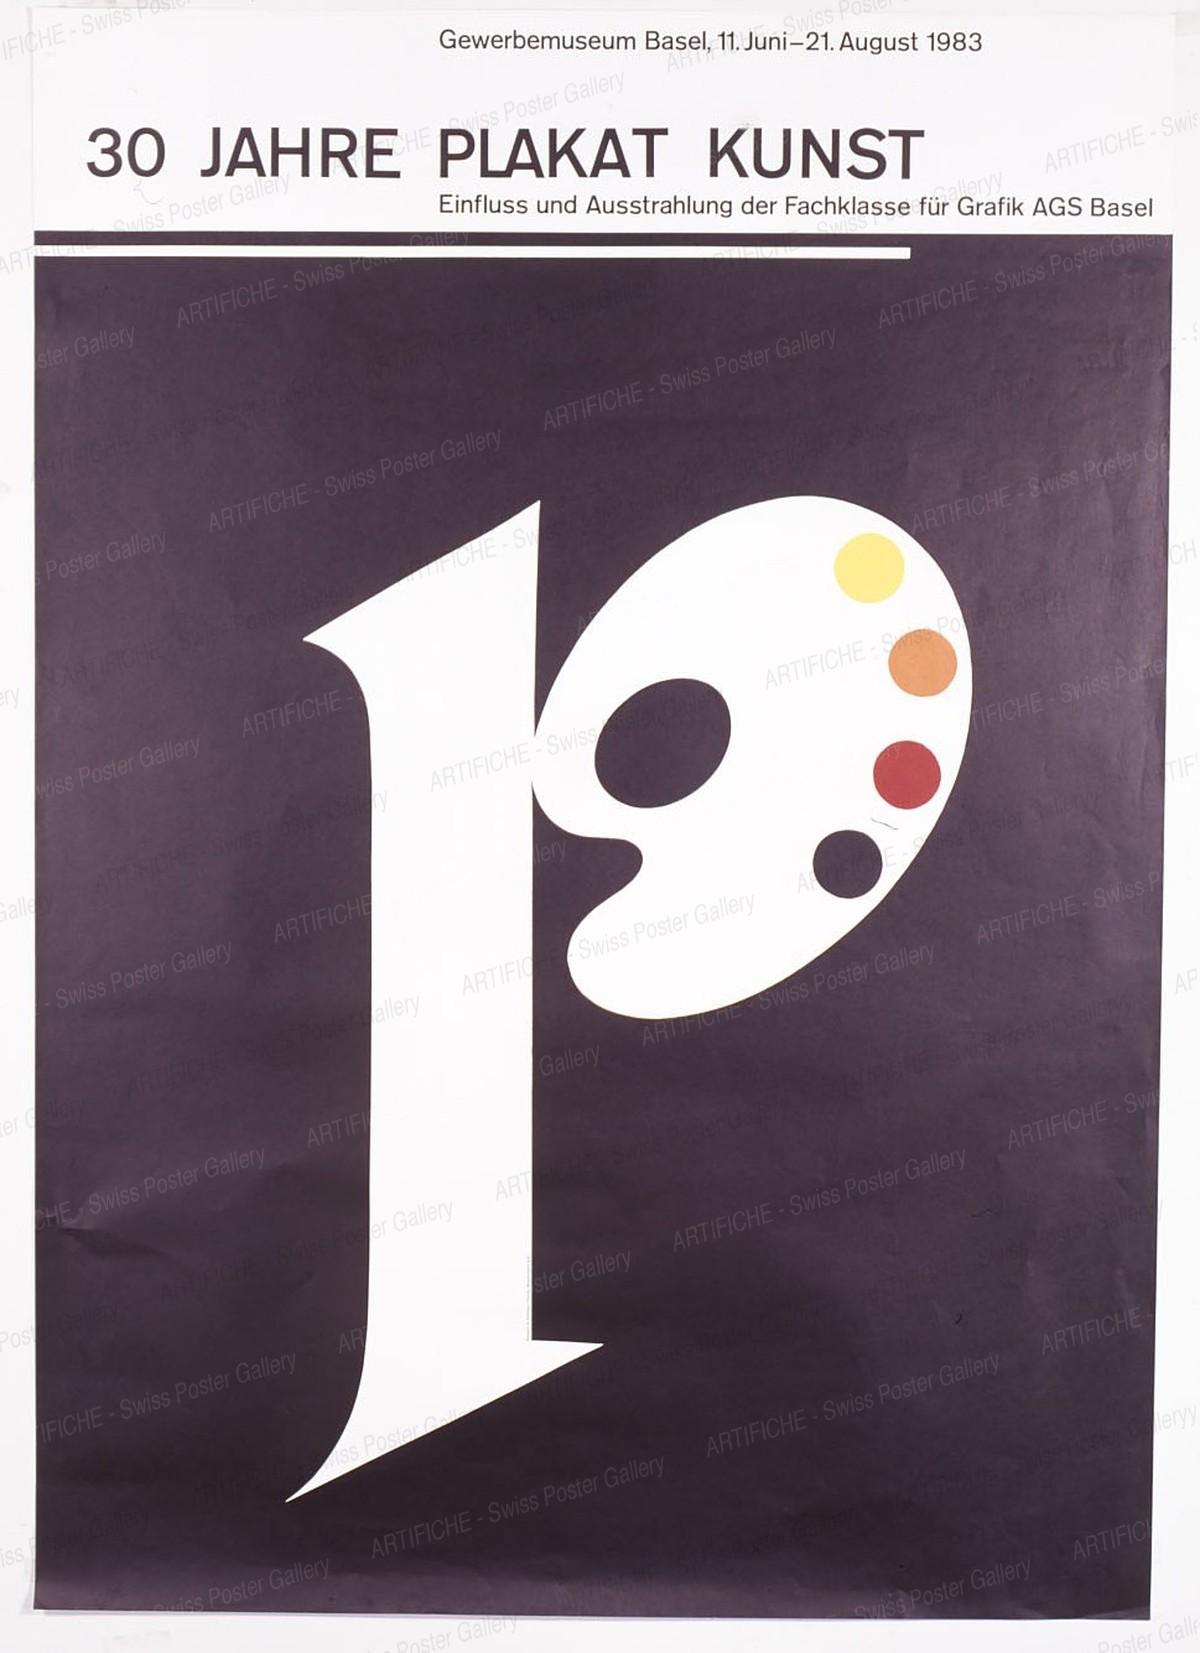 Gewerbemuseum Basel 1983 – 30 JAHRE PLAKATKUNST – Fachklasse für Grafik Basel, Armin Hofmann